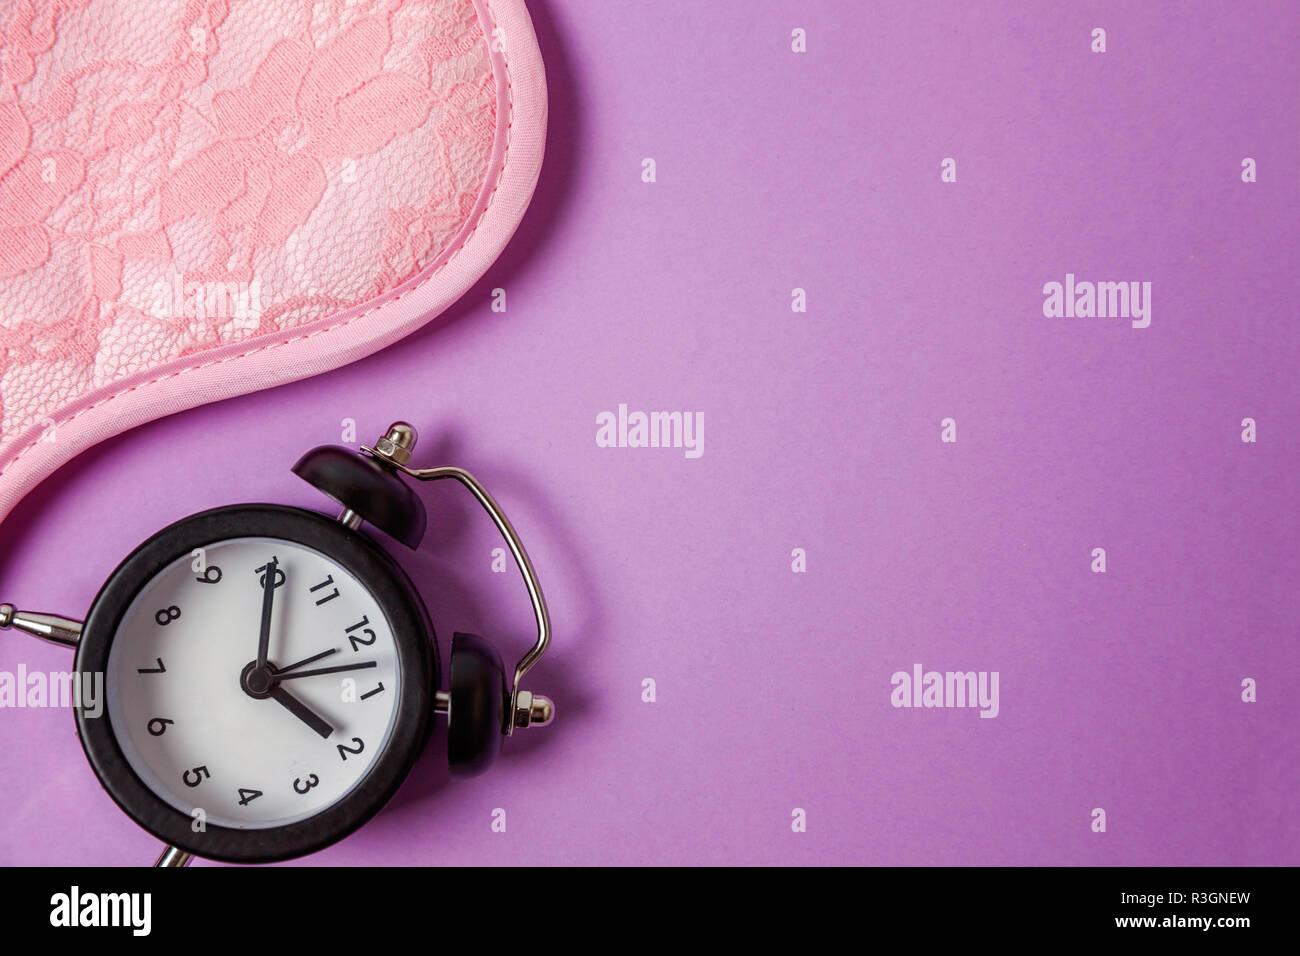 Sleeping Eye Mask Alarm Clock Isolated On Purple Violet Pastel Colourful Trendy Background Do Not Disturb Me Let Me Sleep Rest Good Night Siesta Stock Photo Alamy